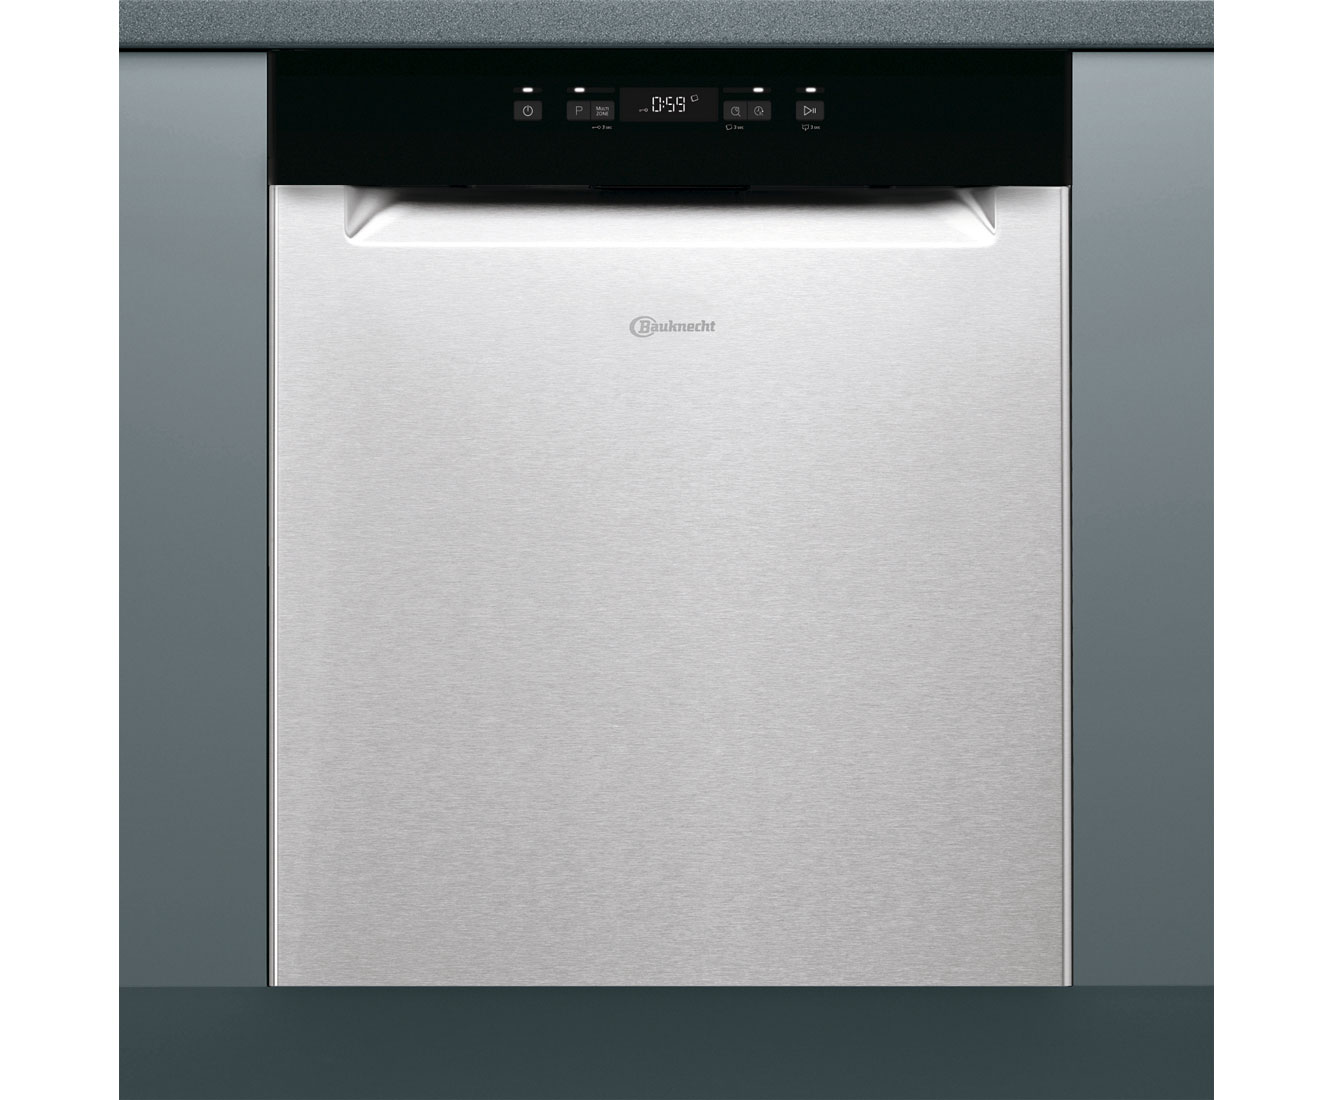 Minibar Kühlschrank Abschließbar : Minibar kühlschrank einbau smeg fab ror standkühlschrank minibar